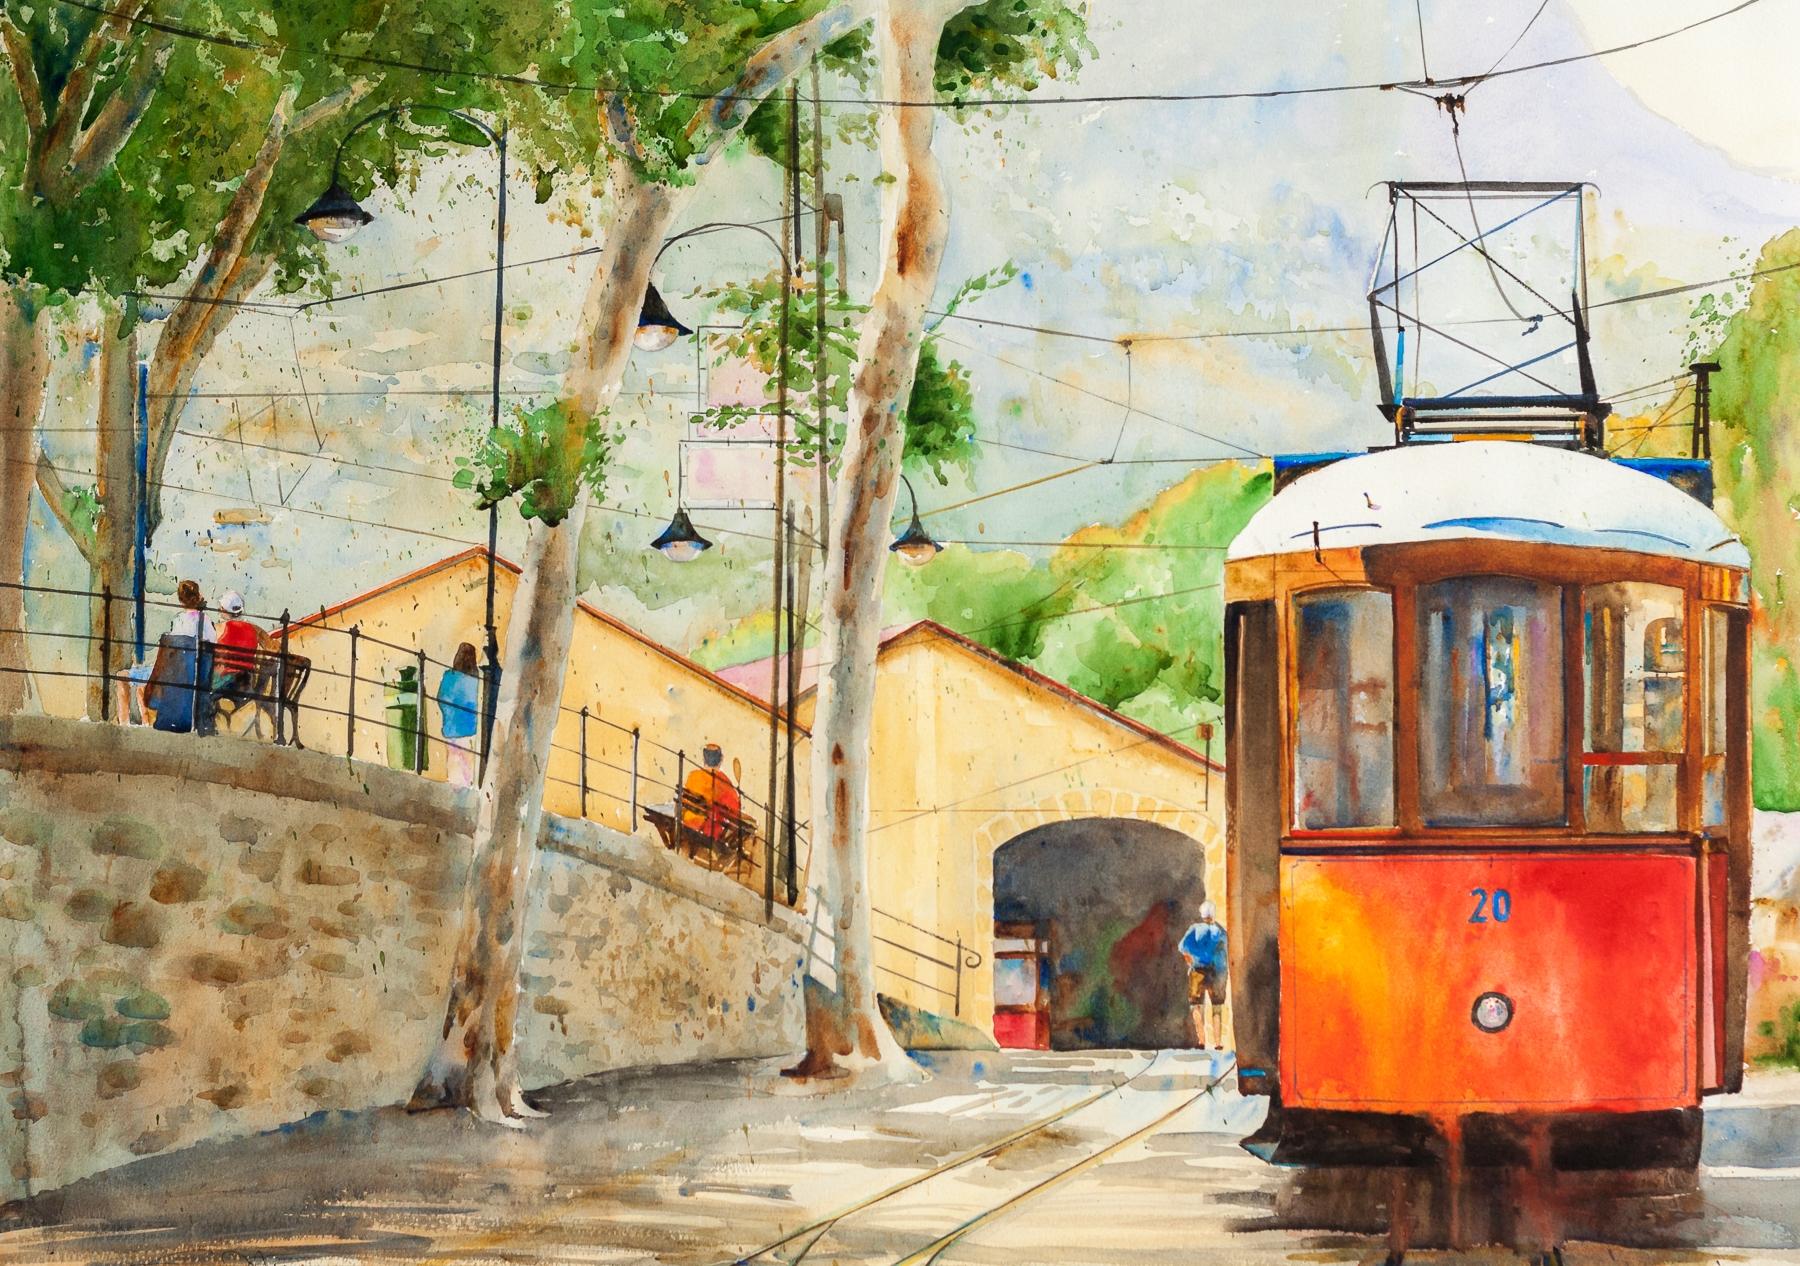 Tranvía de Soller